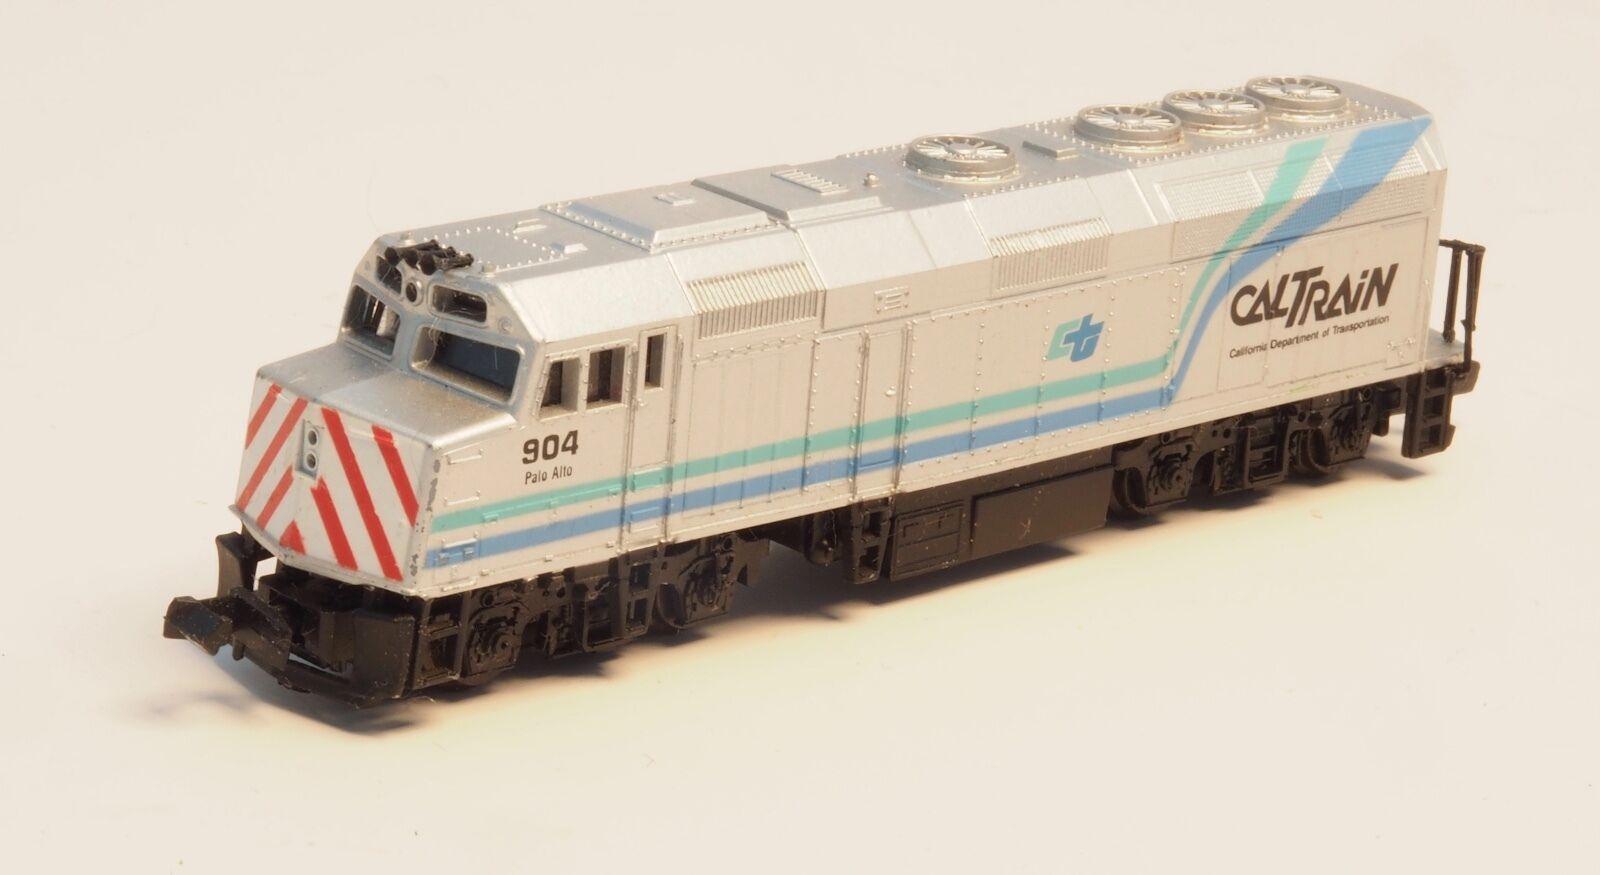 Life Like N-Scale Caltrain EMD F40PH Palo Alto  904 Alimentato Locomotiva  2